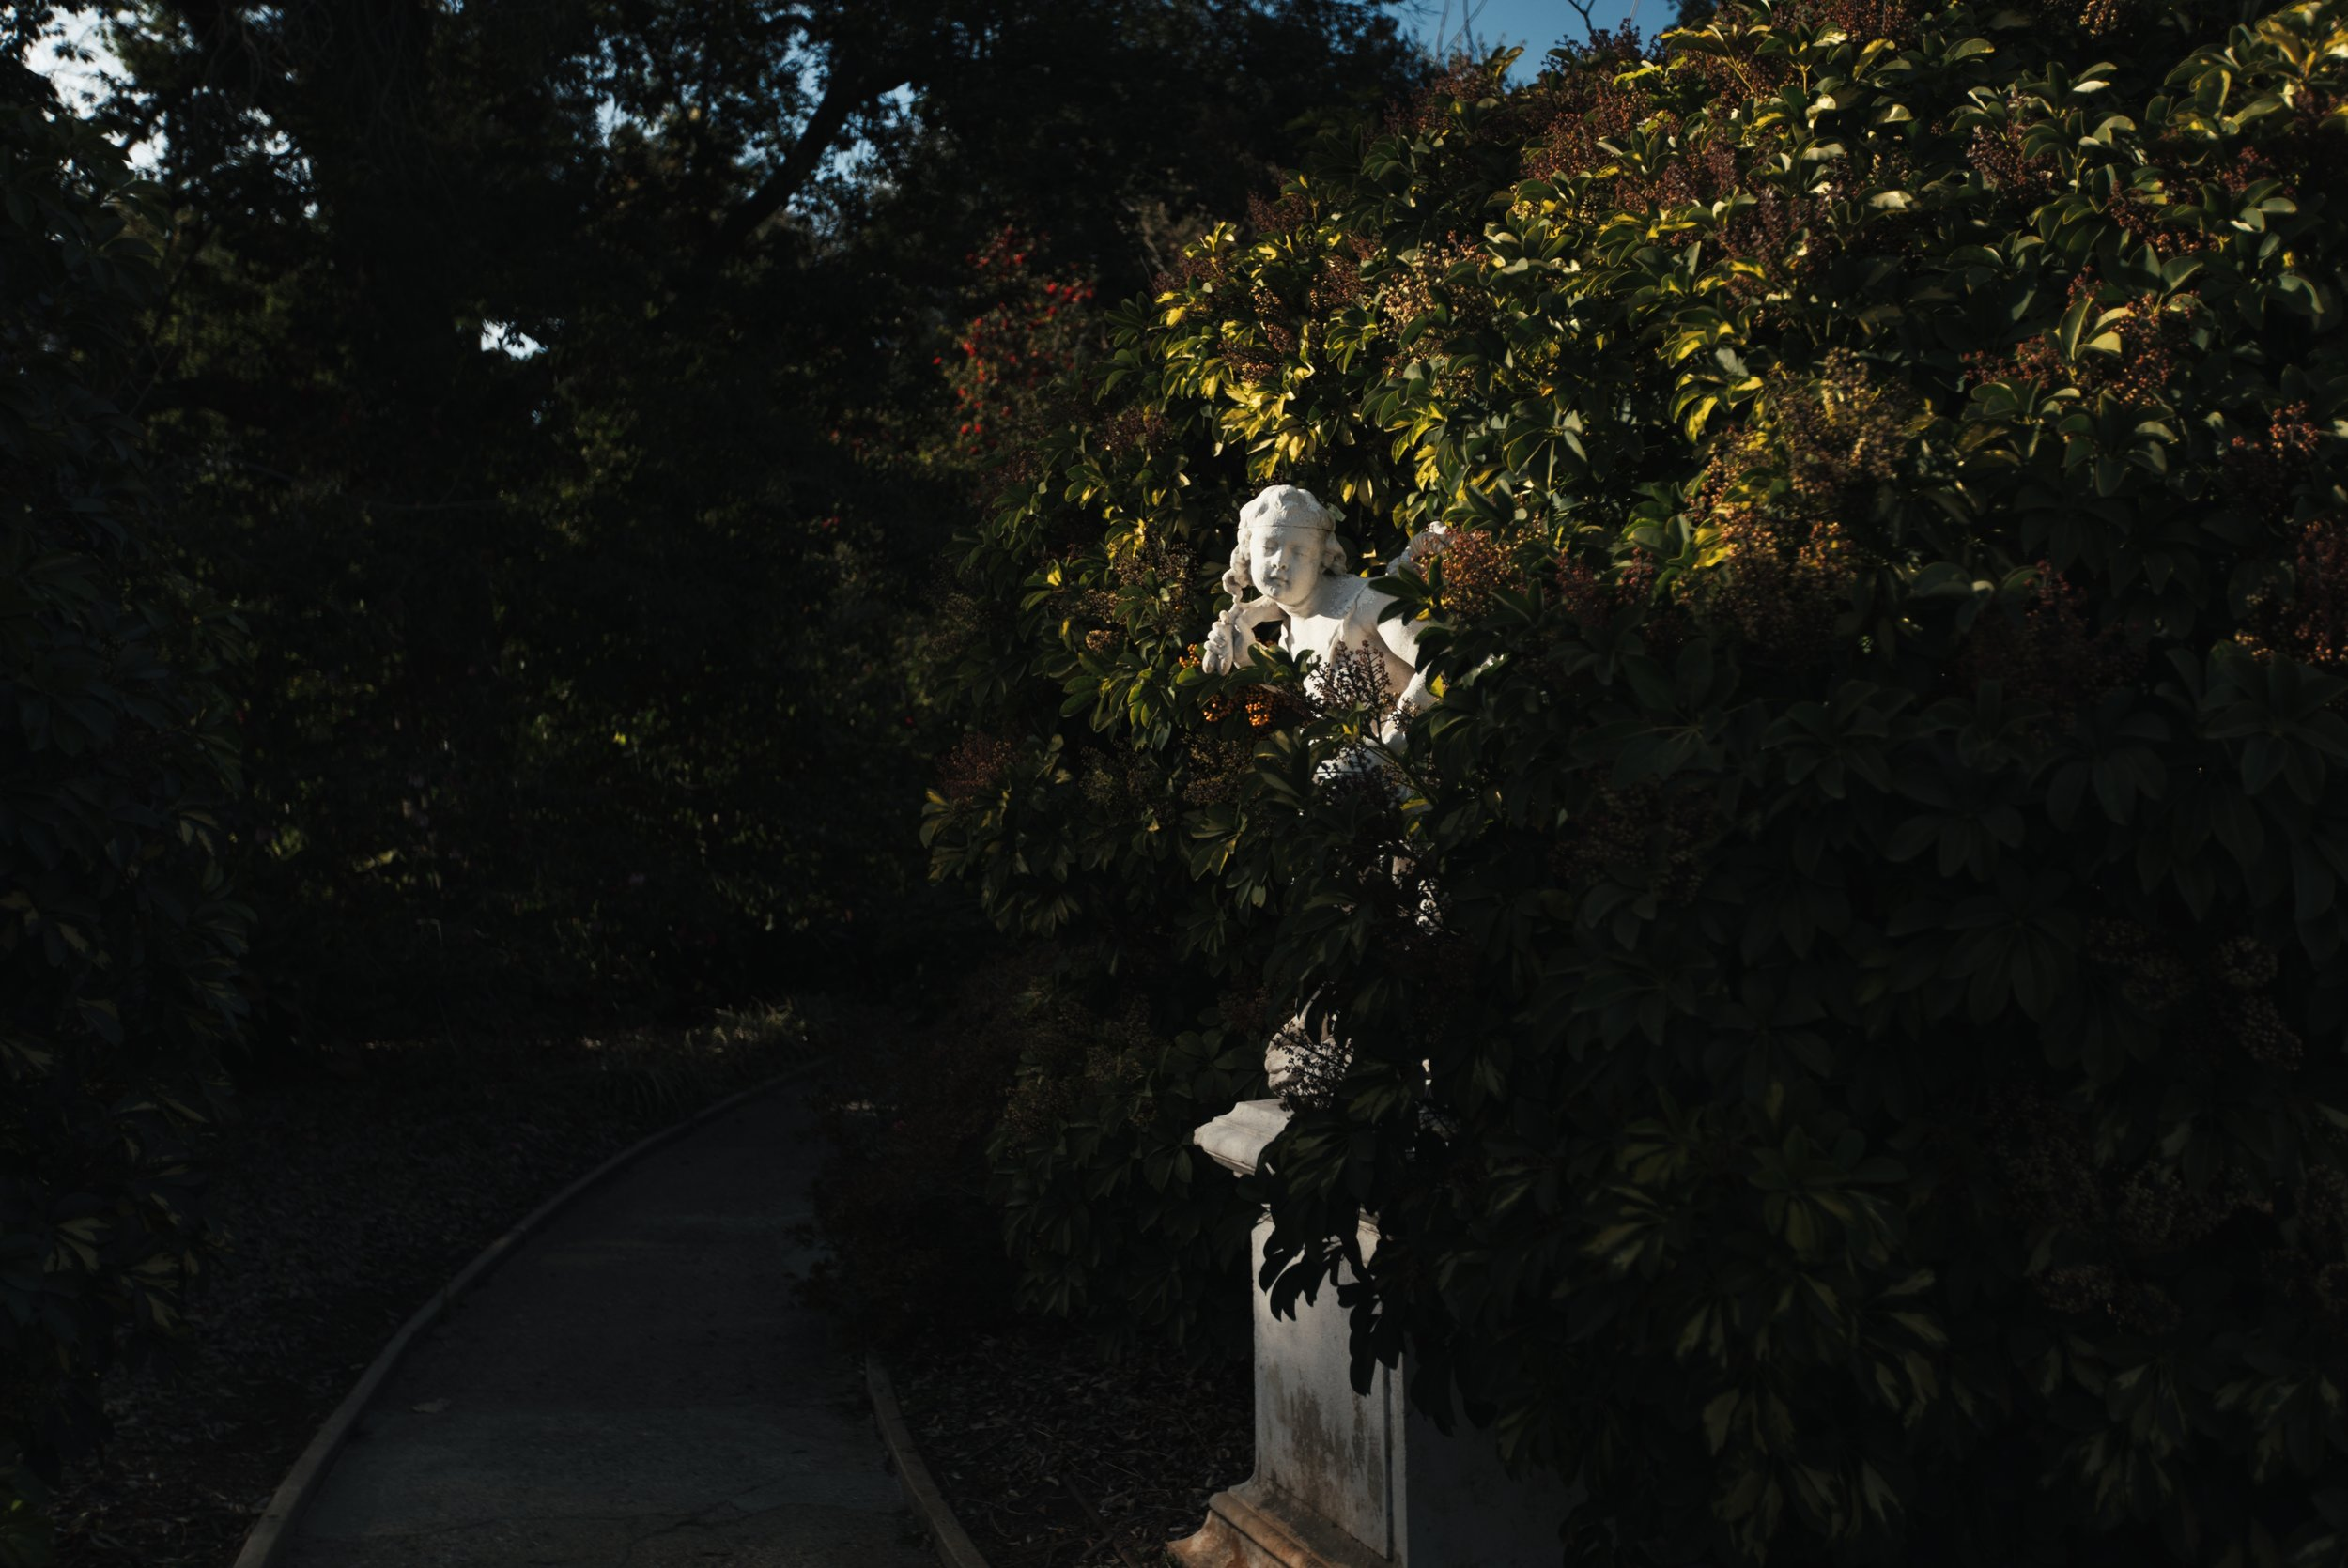 statue 1_1.86.1.jpg